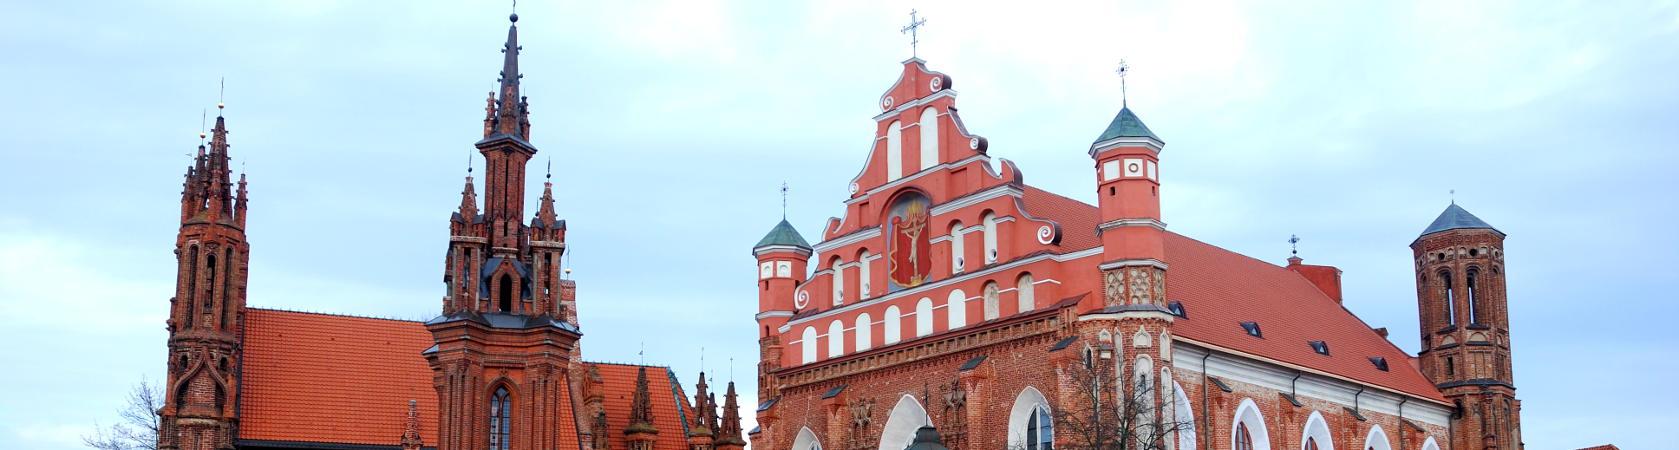 Sv. Onos ir Bernardinu baznycia